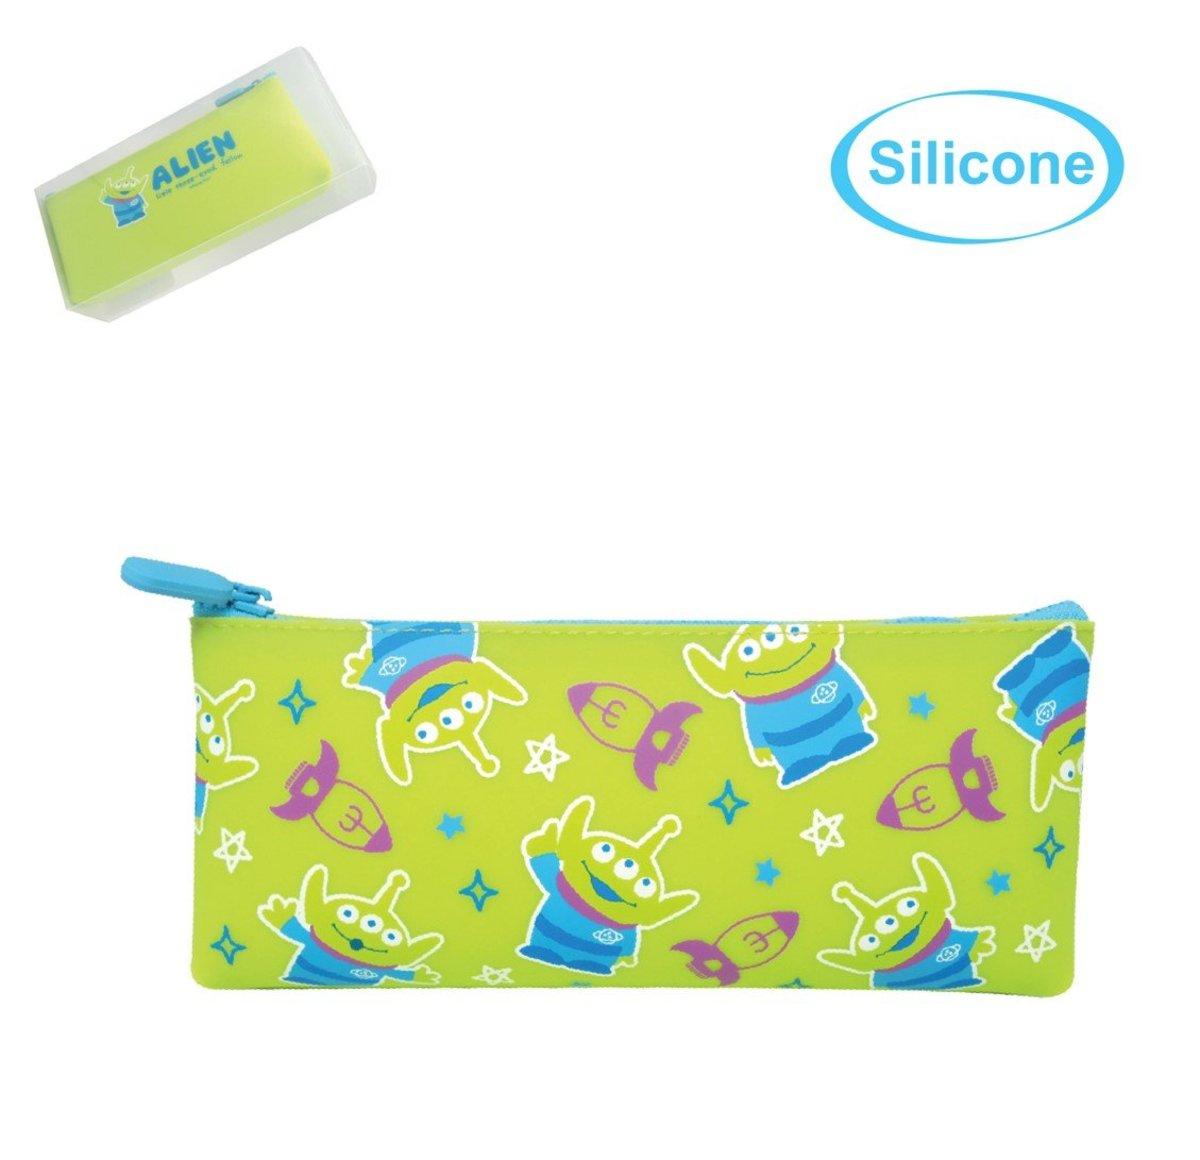 Silicone Pencil Bag(Alien)(Licensed by Disney)